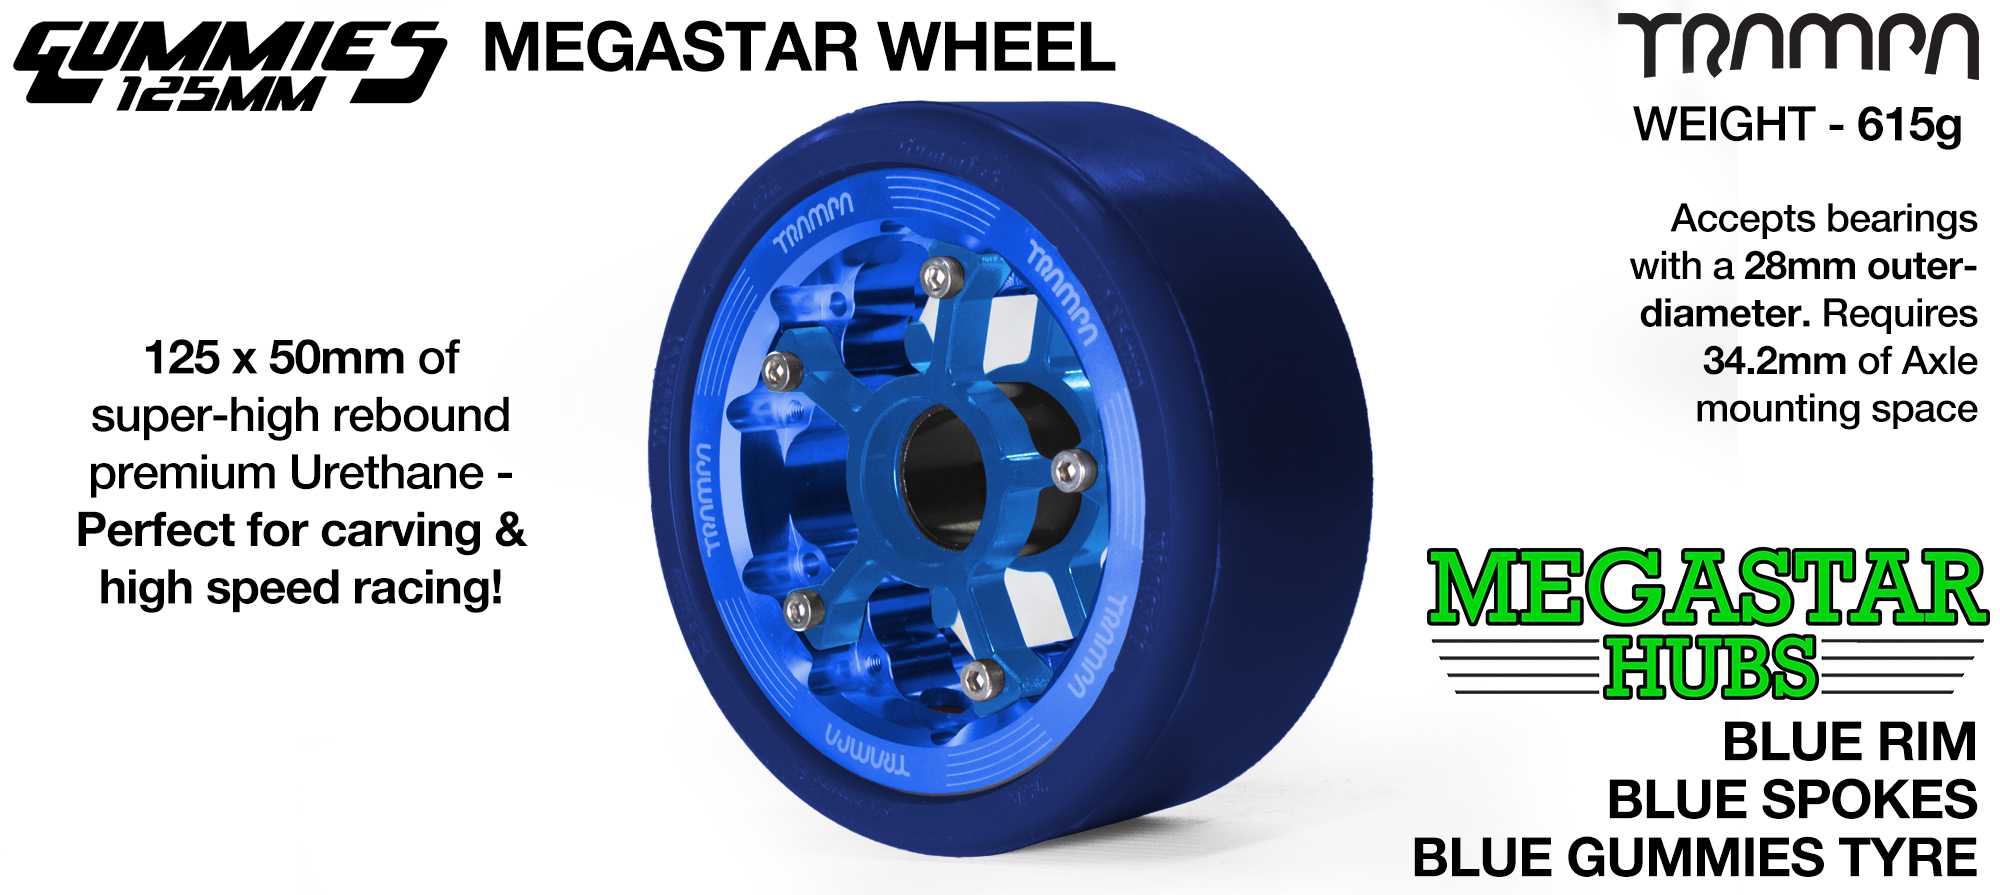 BLUE MEGASTAR Rim with BLUE Spokes with BLUE Gummies   - The Ultimate Longboard Wheel